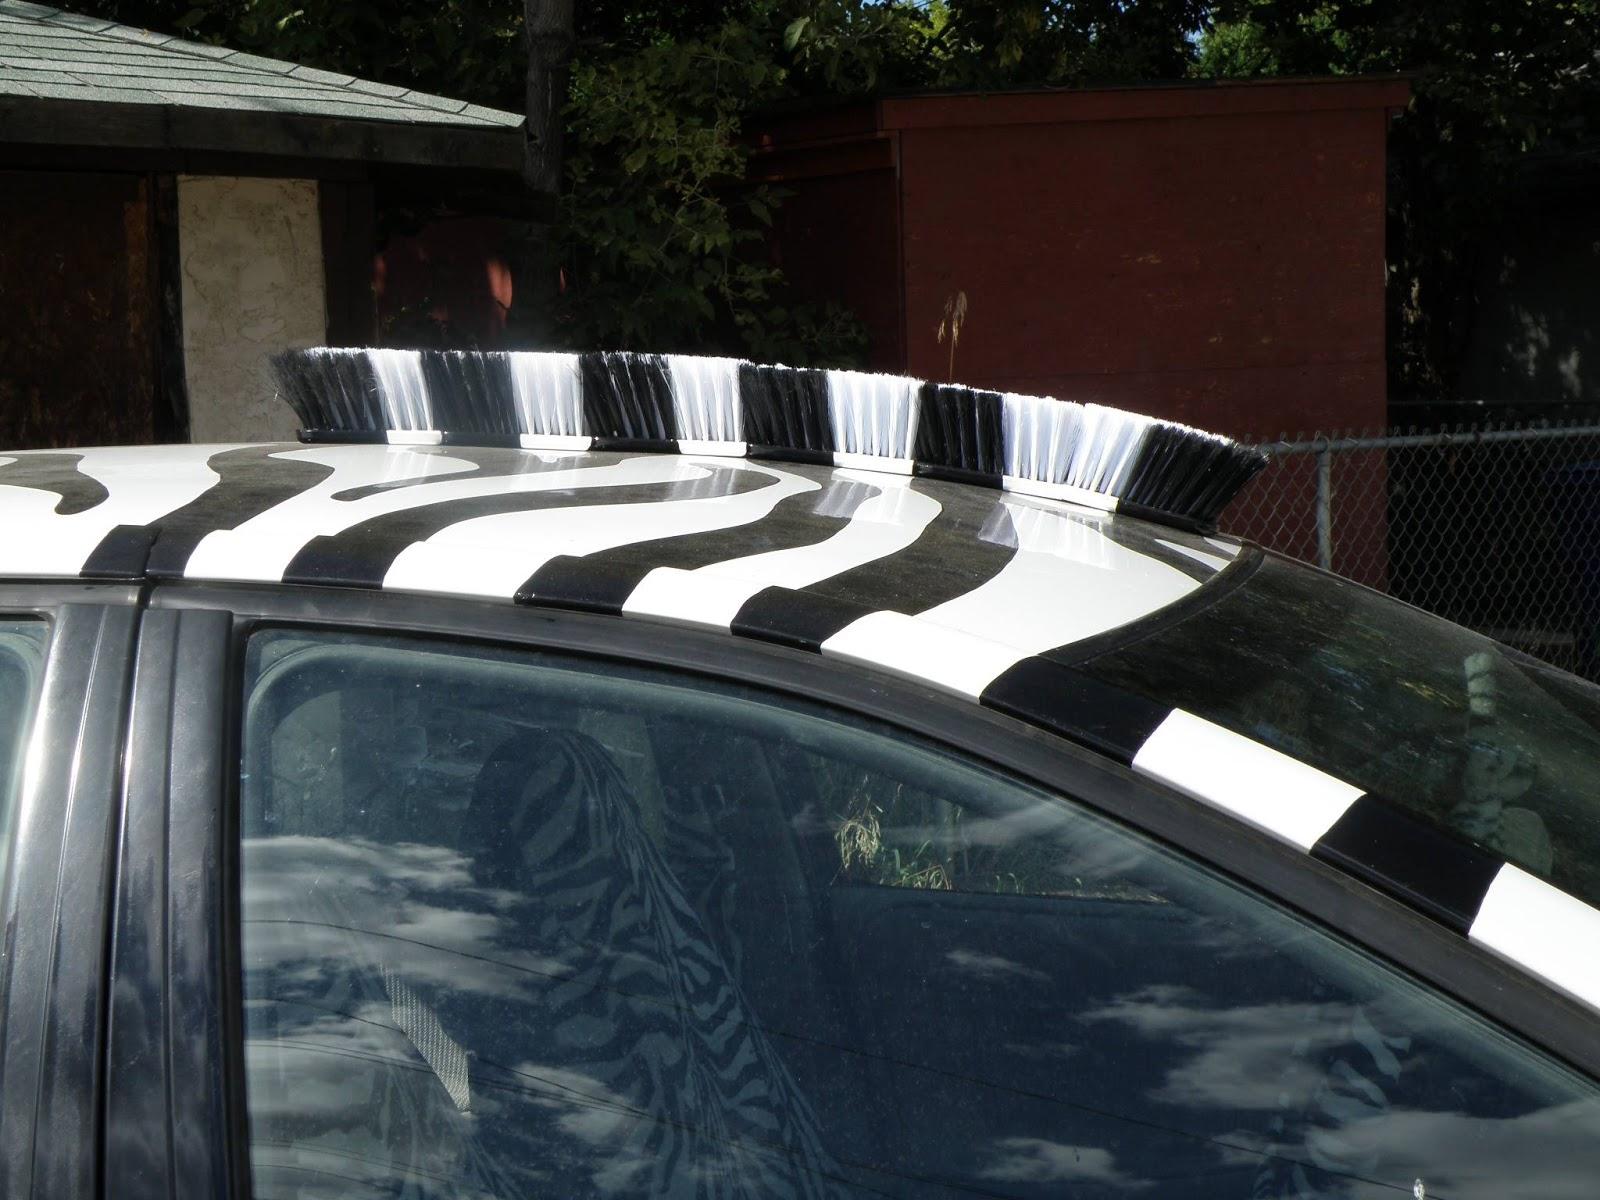 The Zebra Car - Saskatoon, SK, Canada